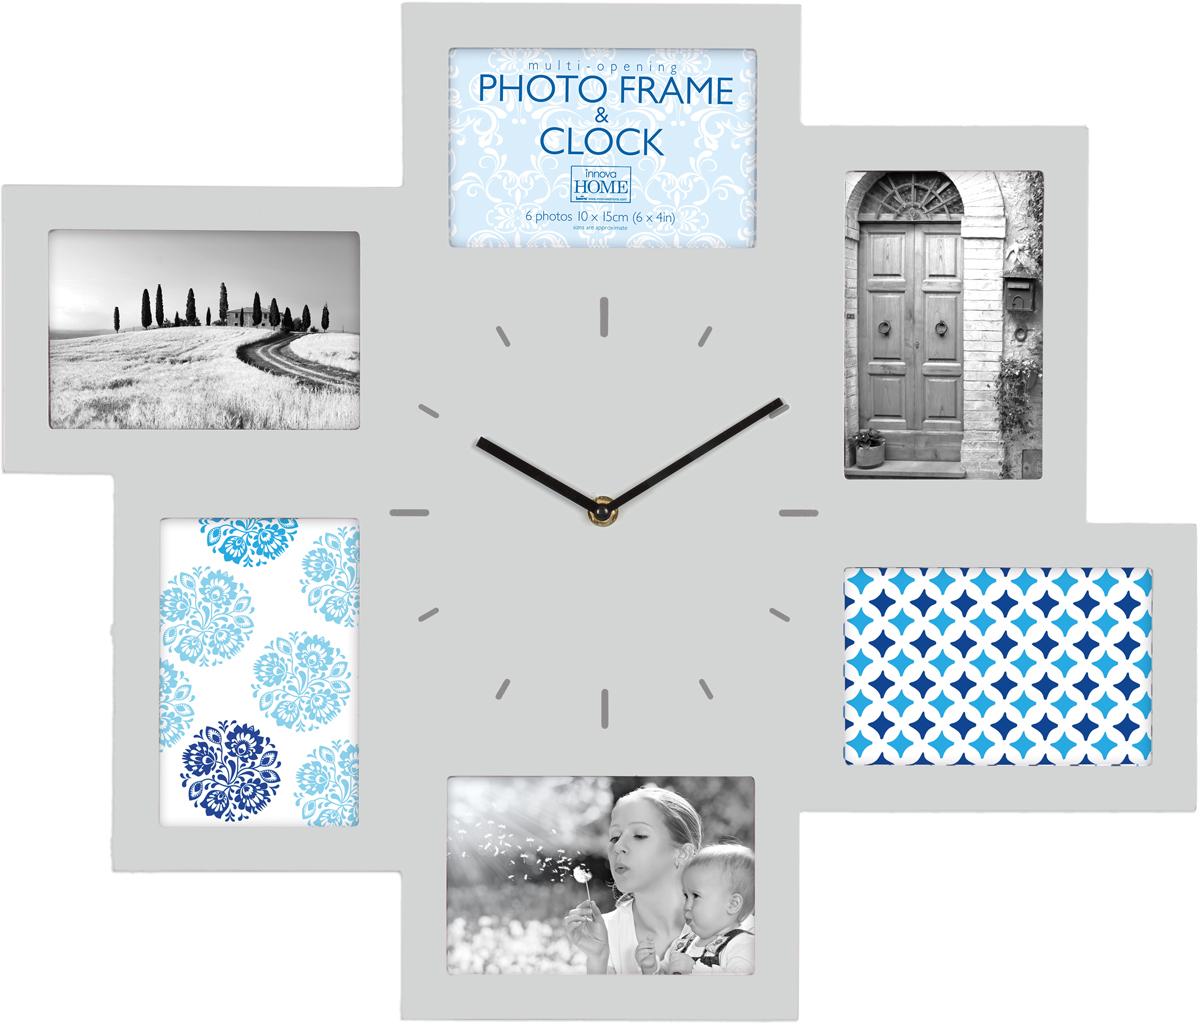 цена на Часы-мультирамка Innova W07369, на 6 фото 10х15, цвет: серый, 46 x 54 см